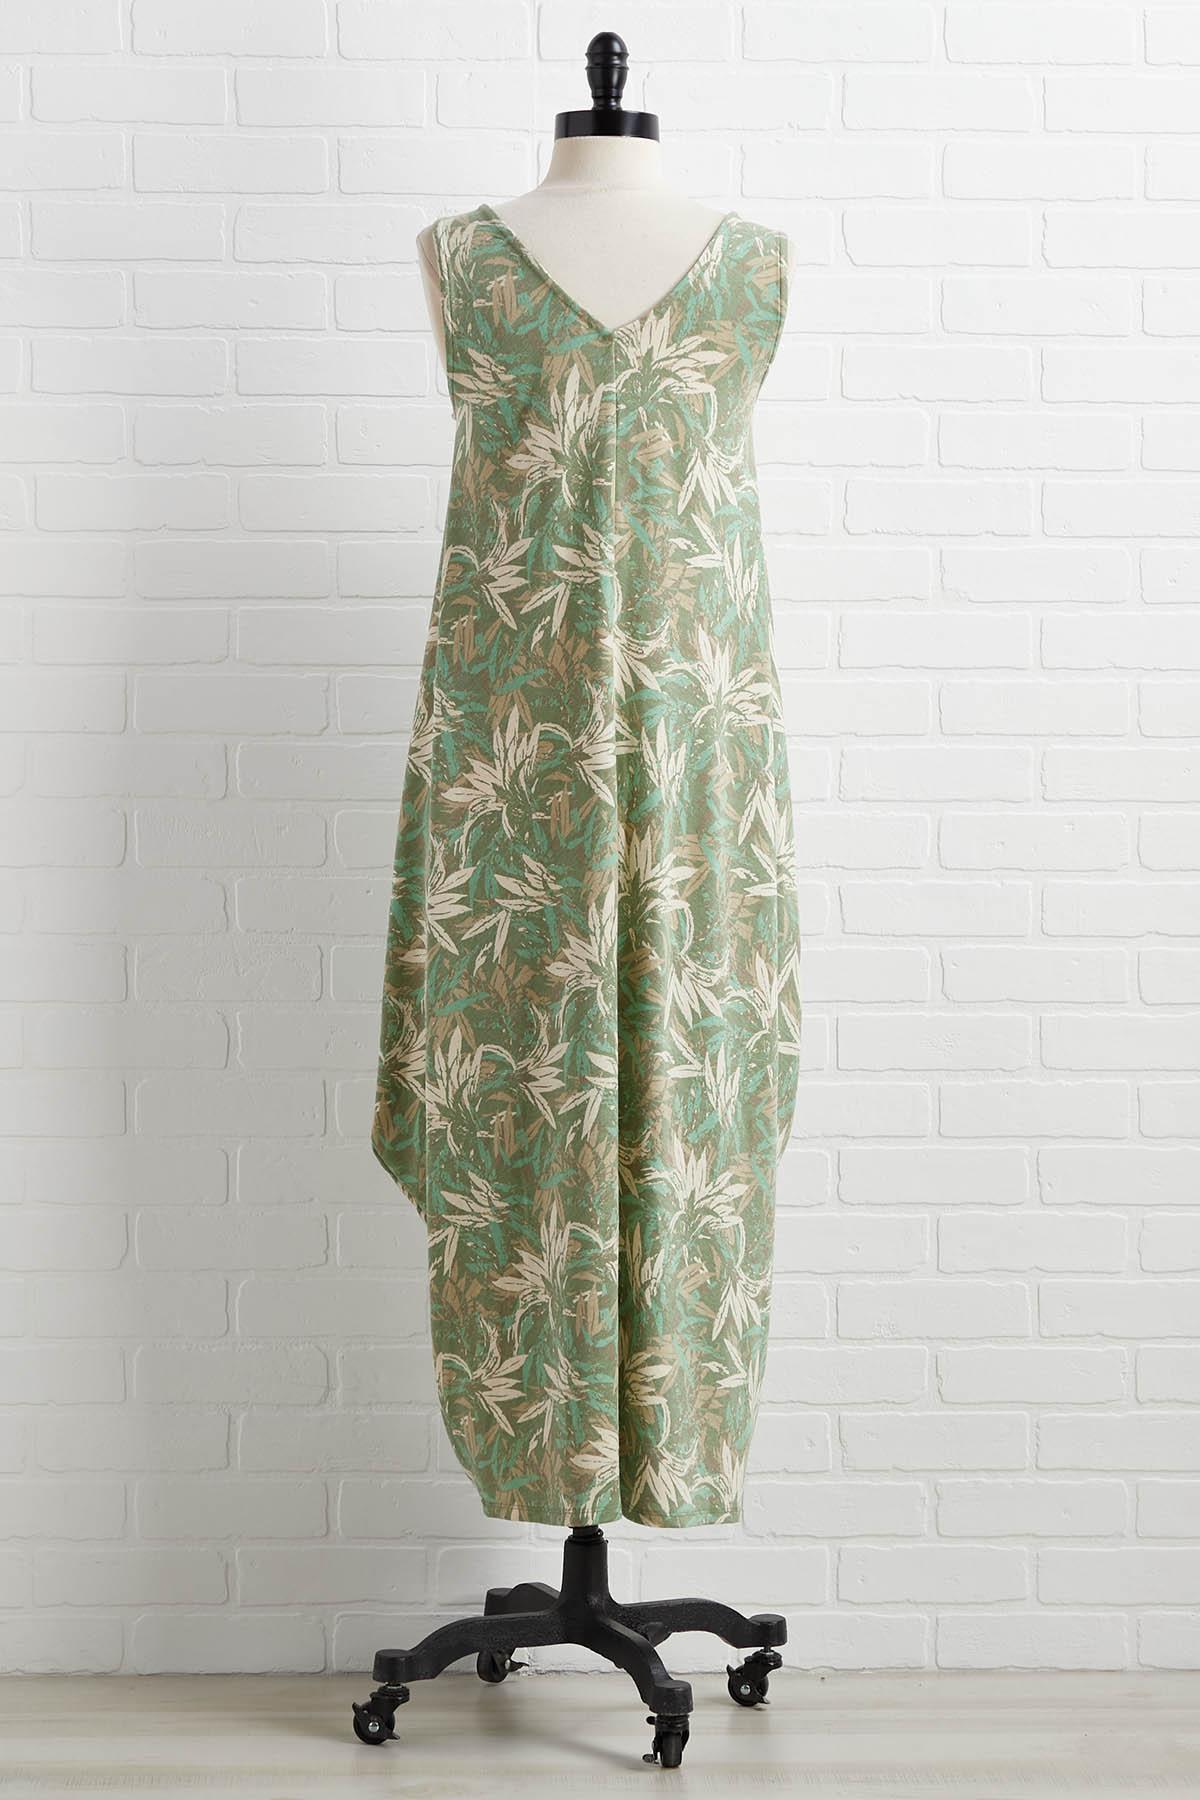 Remaining Palm Dress